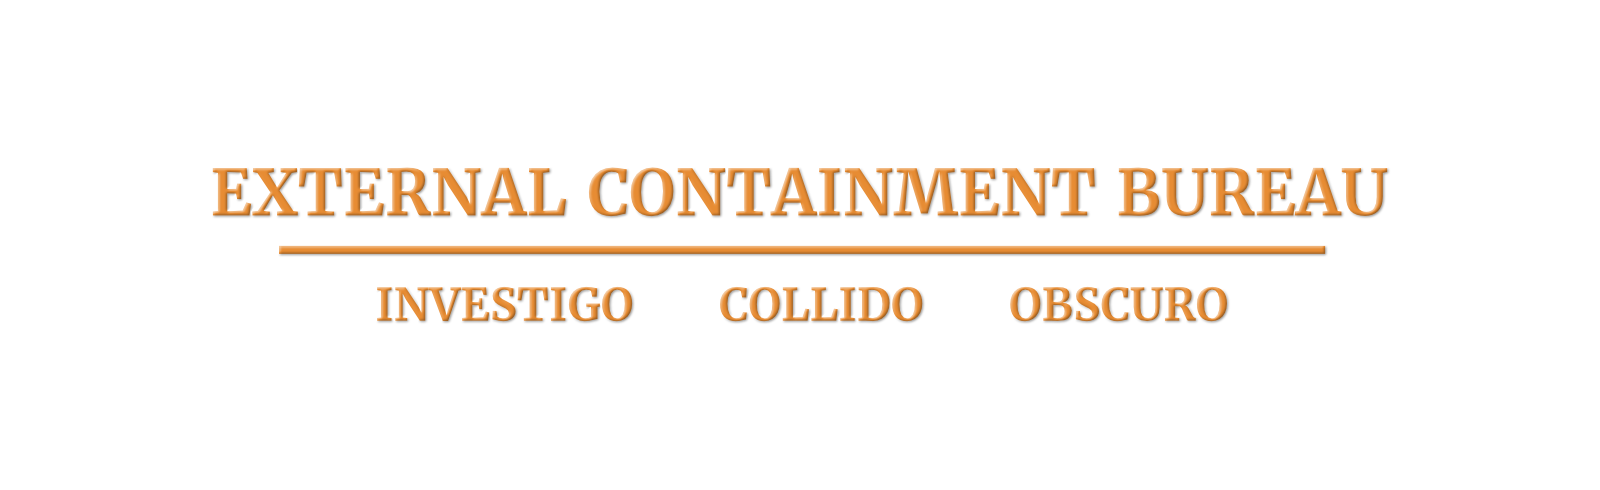 External Containment Bureau